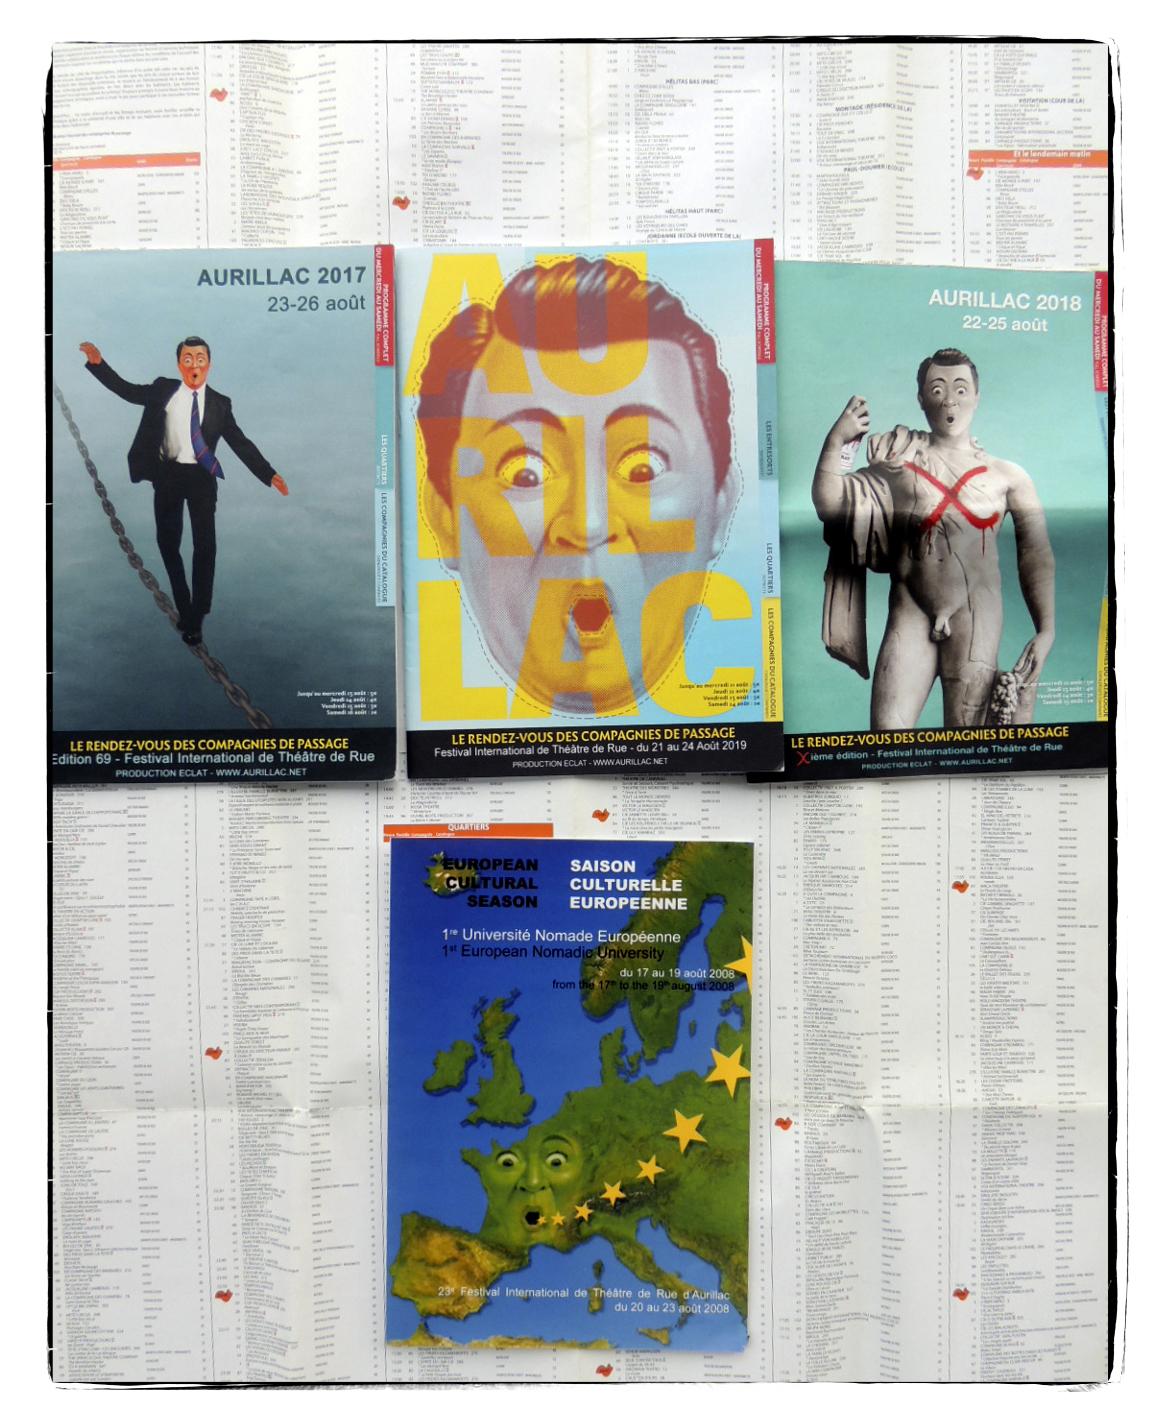 Association Eclat | Festival international de théâtre de rue | Aurillac |